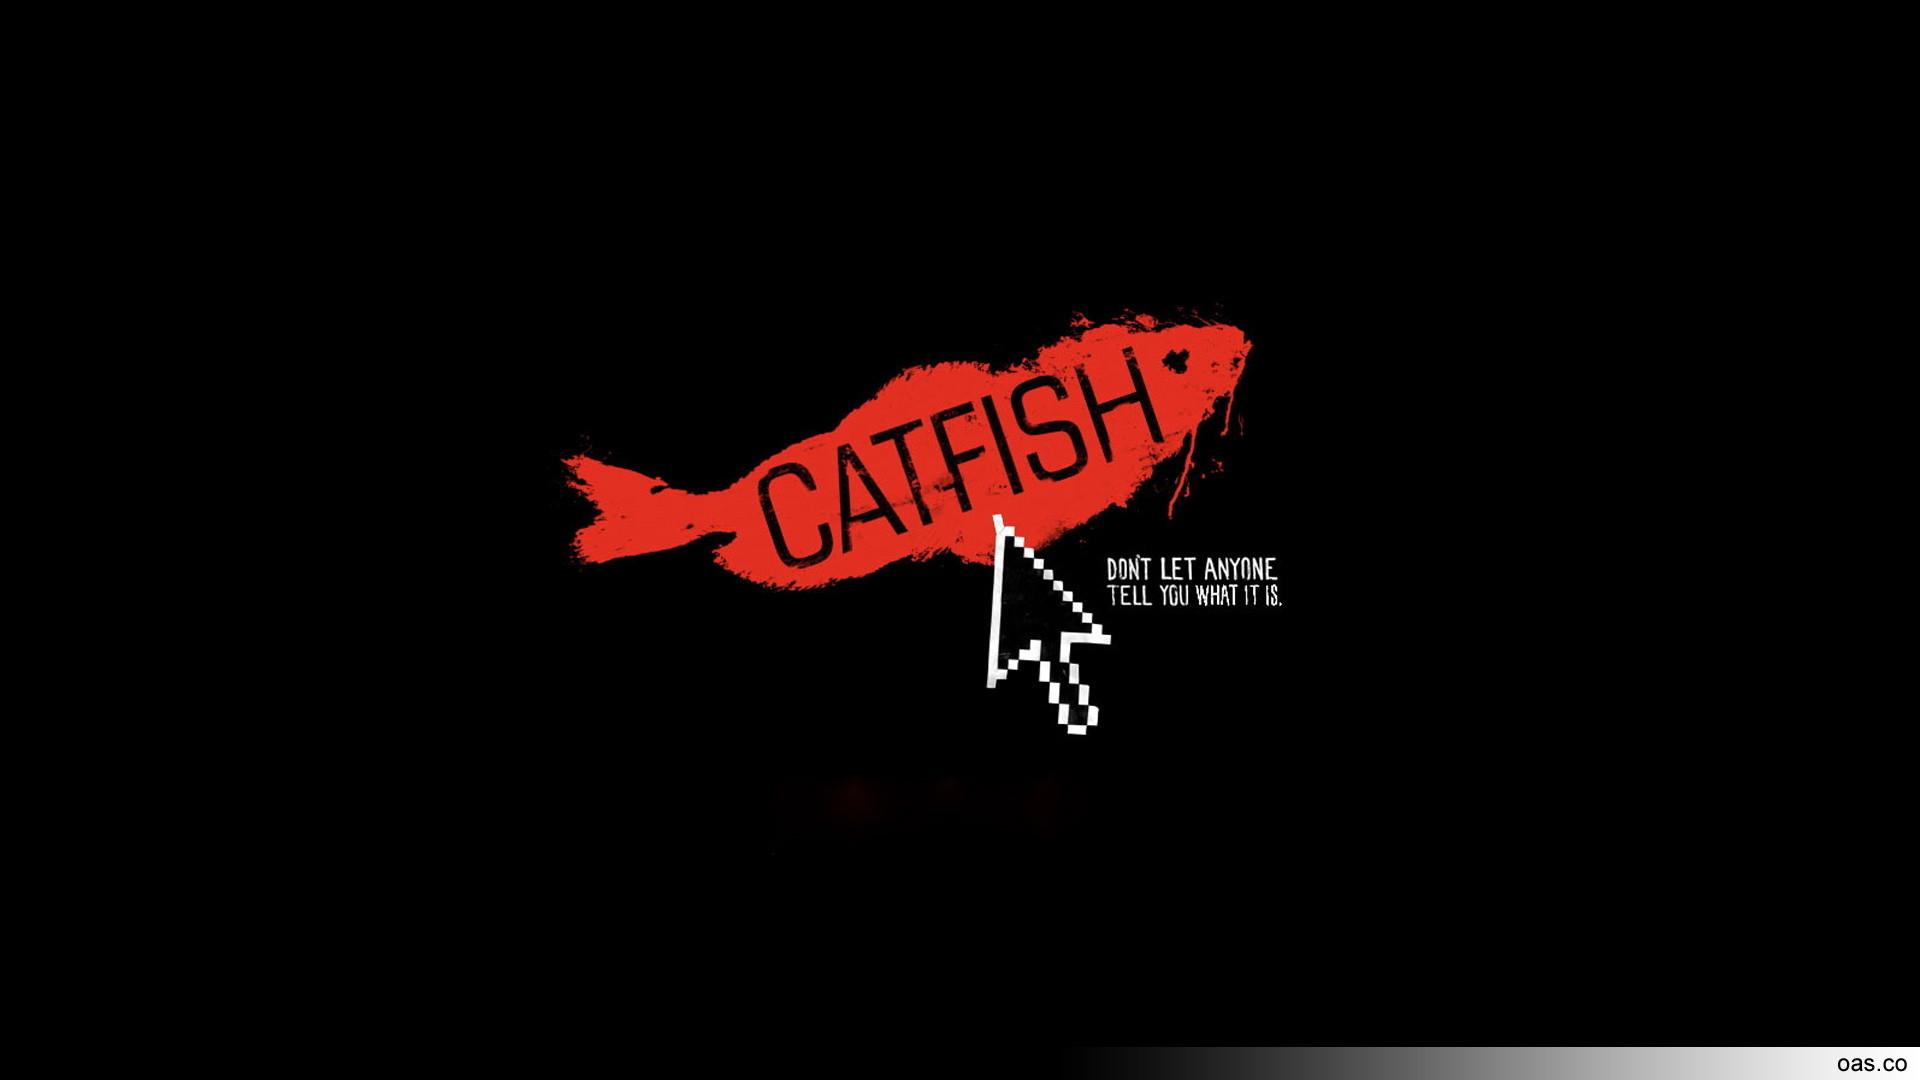 Catfishing term